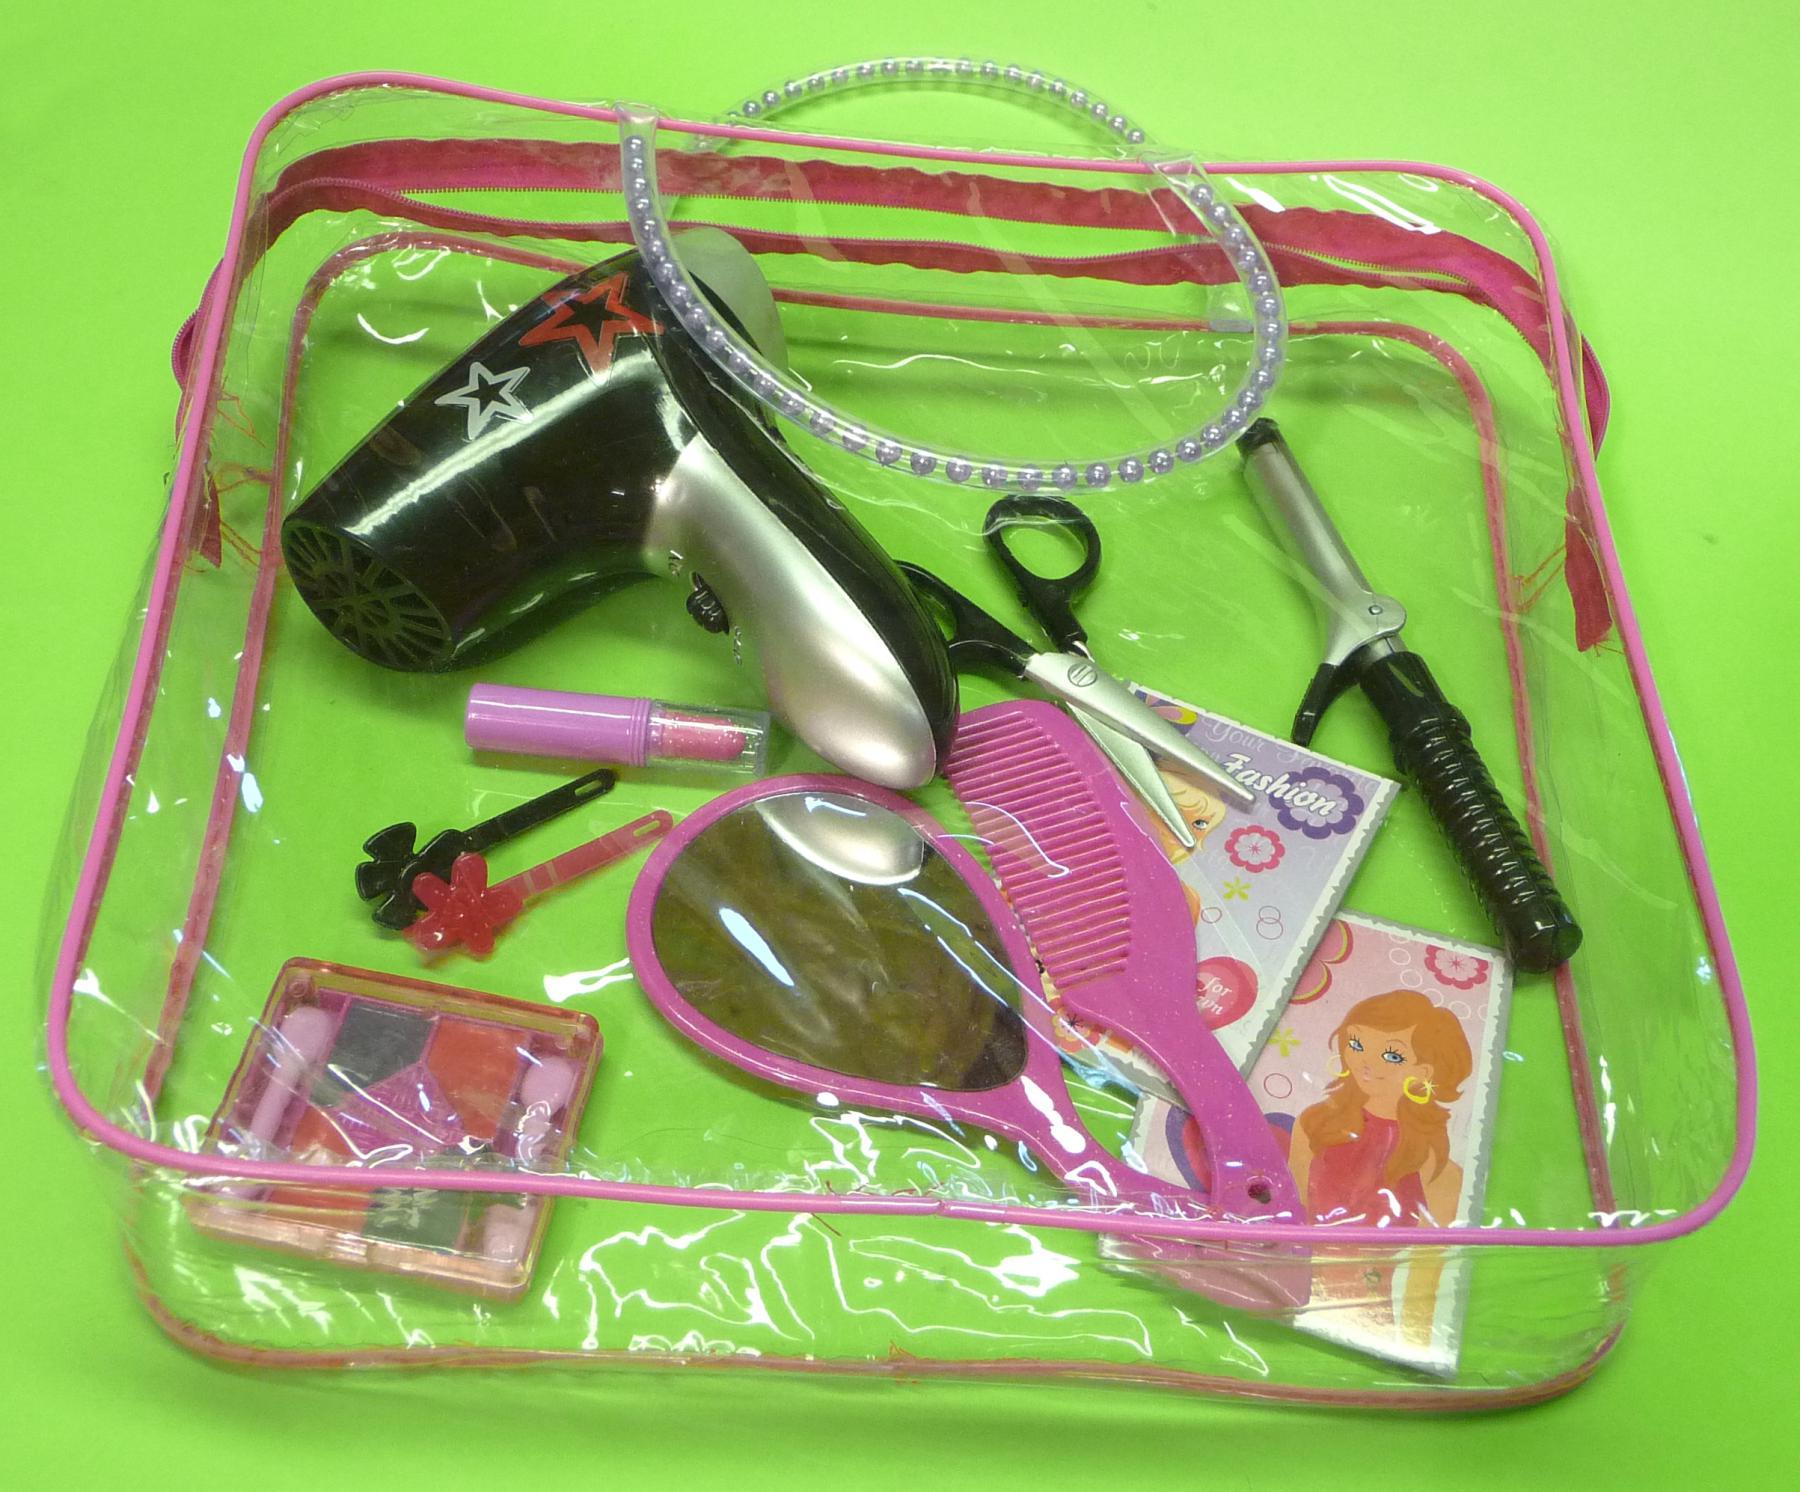 Kinder Friseur Beauty Spielzeug Set Mit Funktions-fÖn & Tasche ...